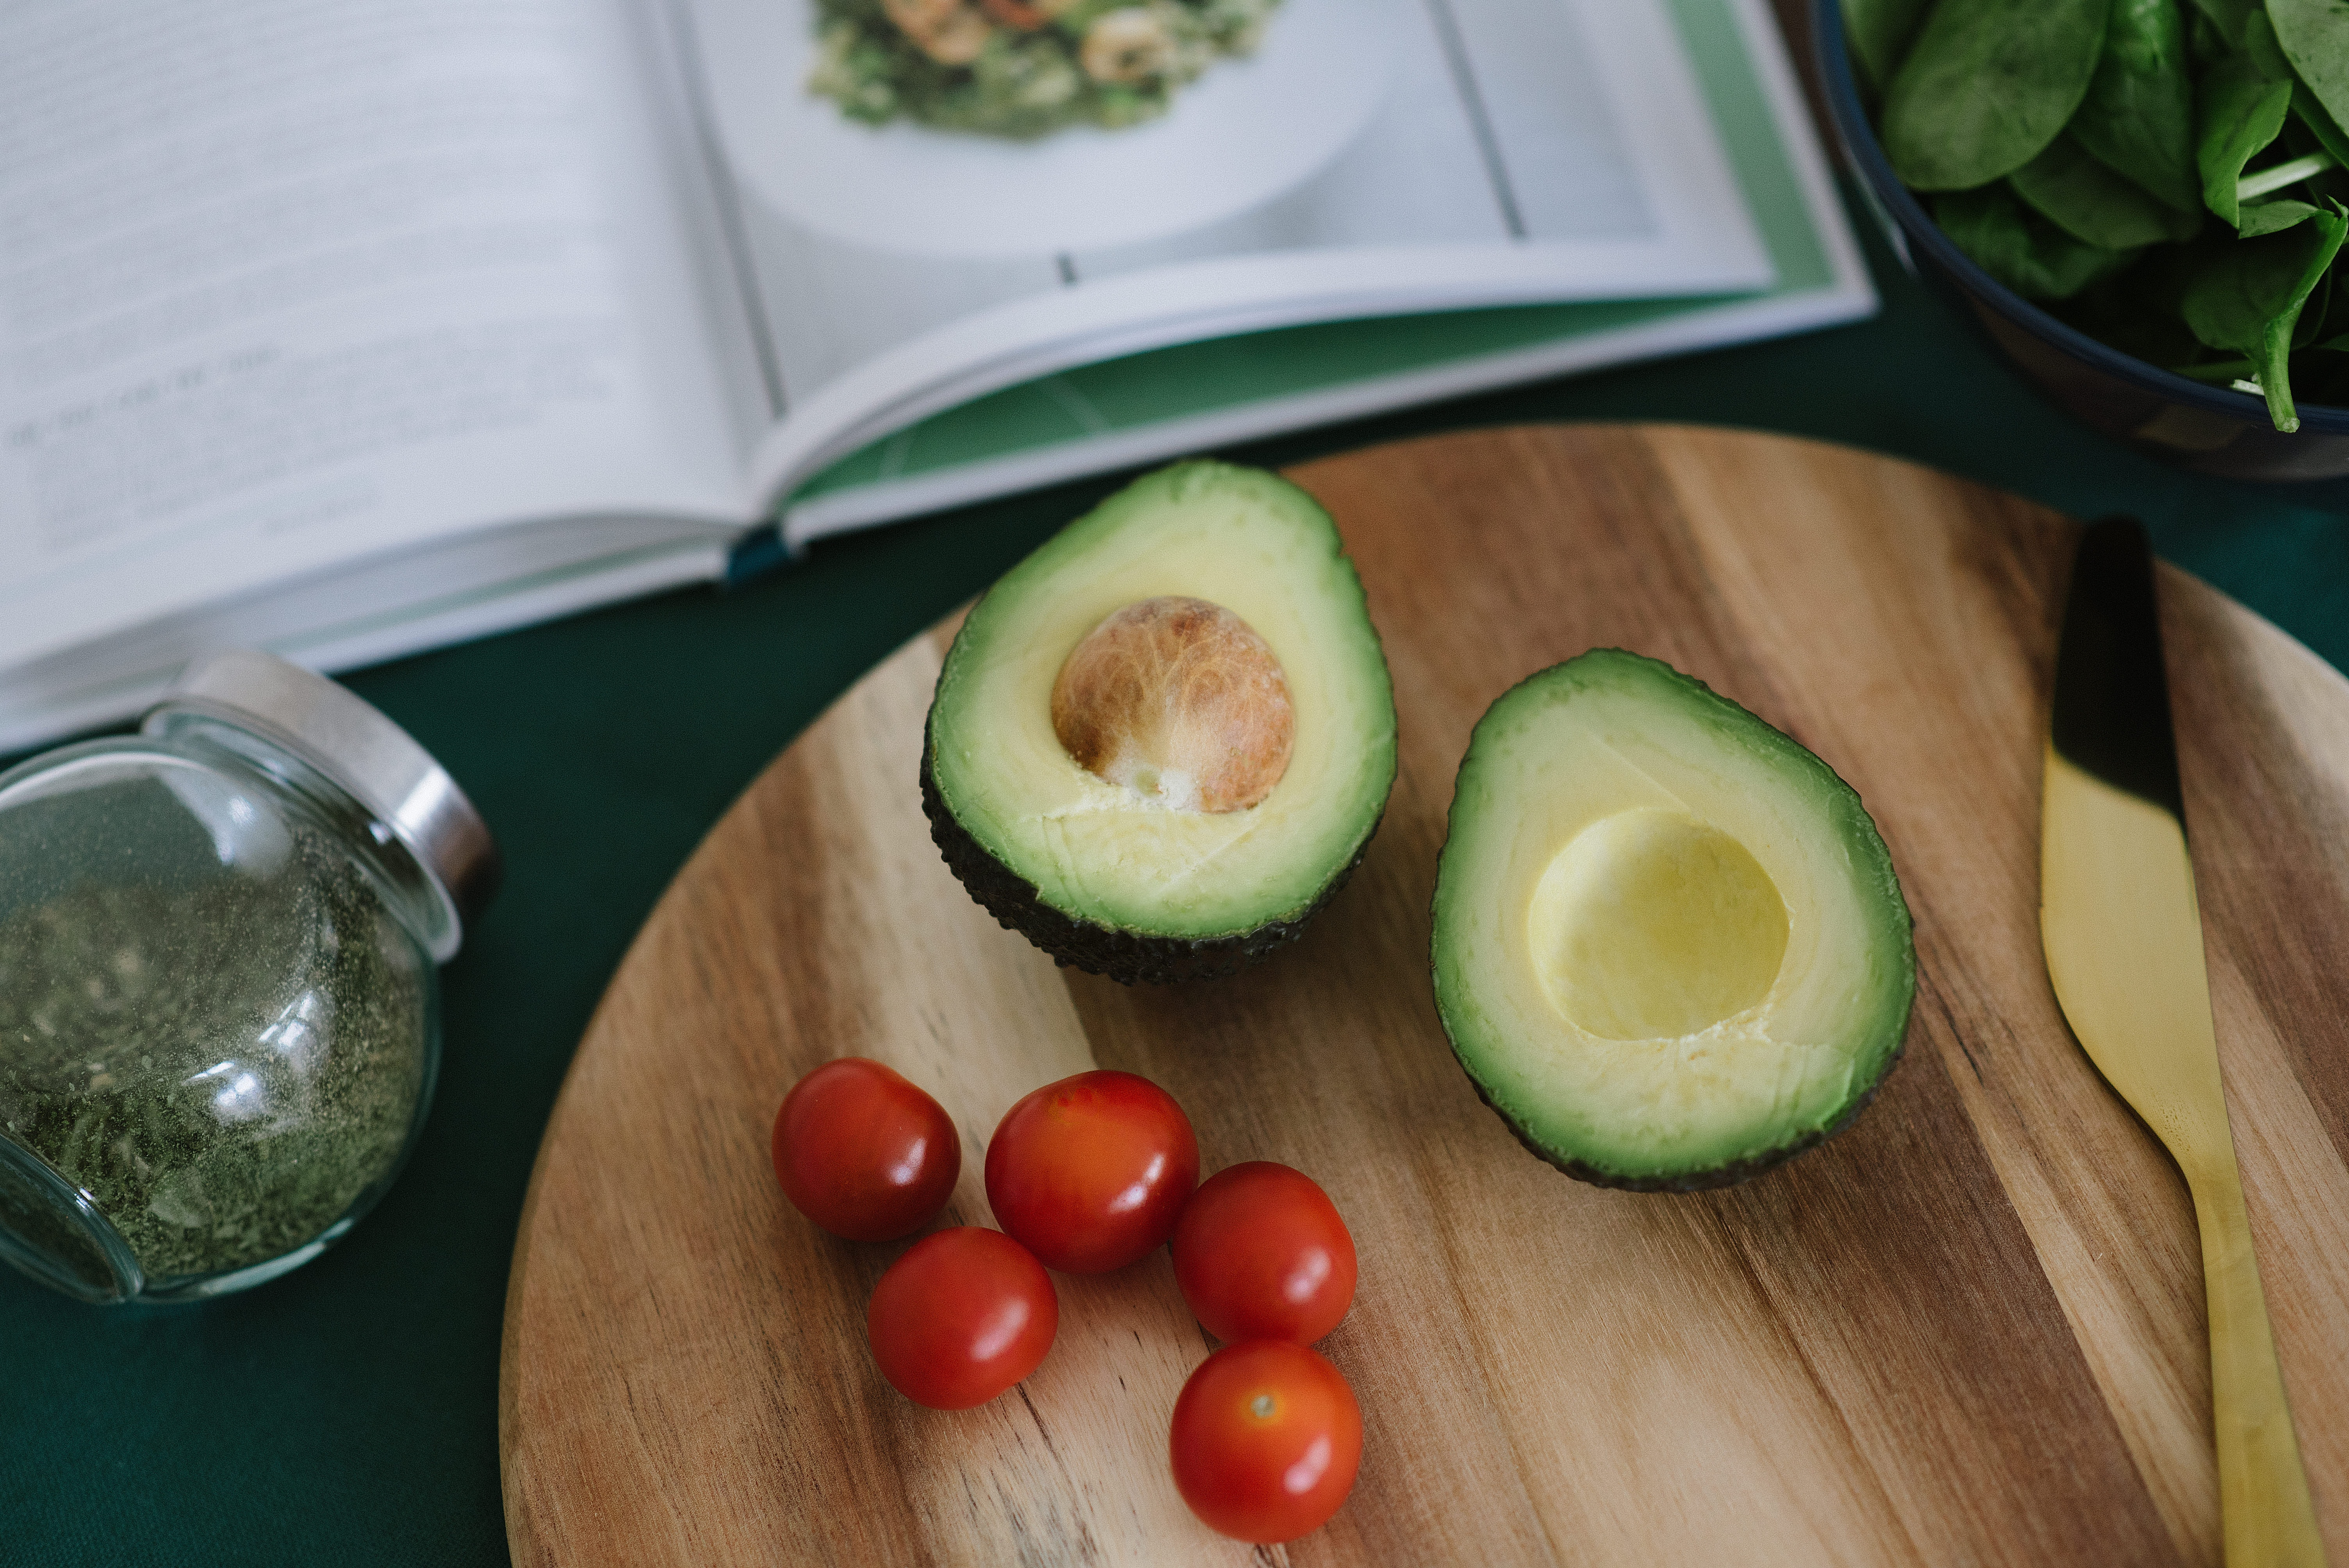 avocado-cherry-tomatoes-chopping-board-1166419